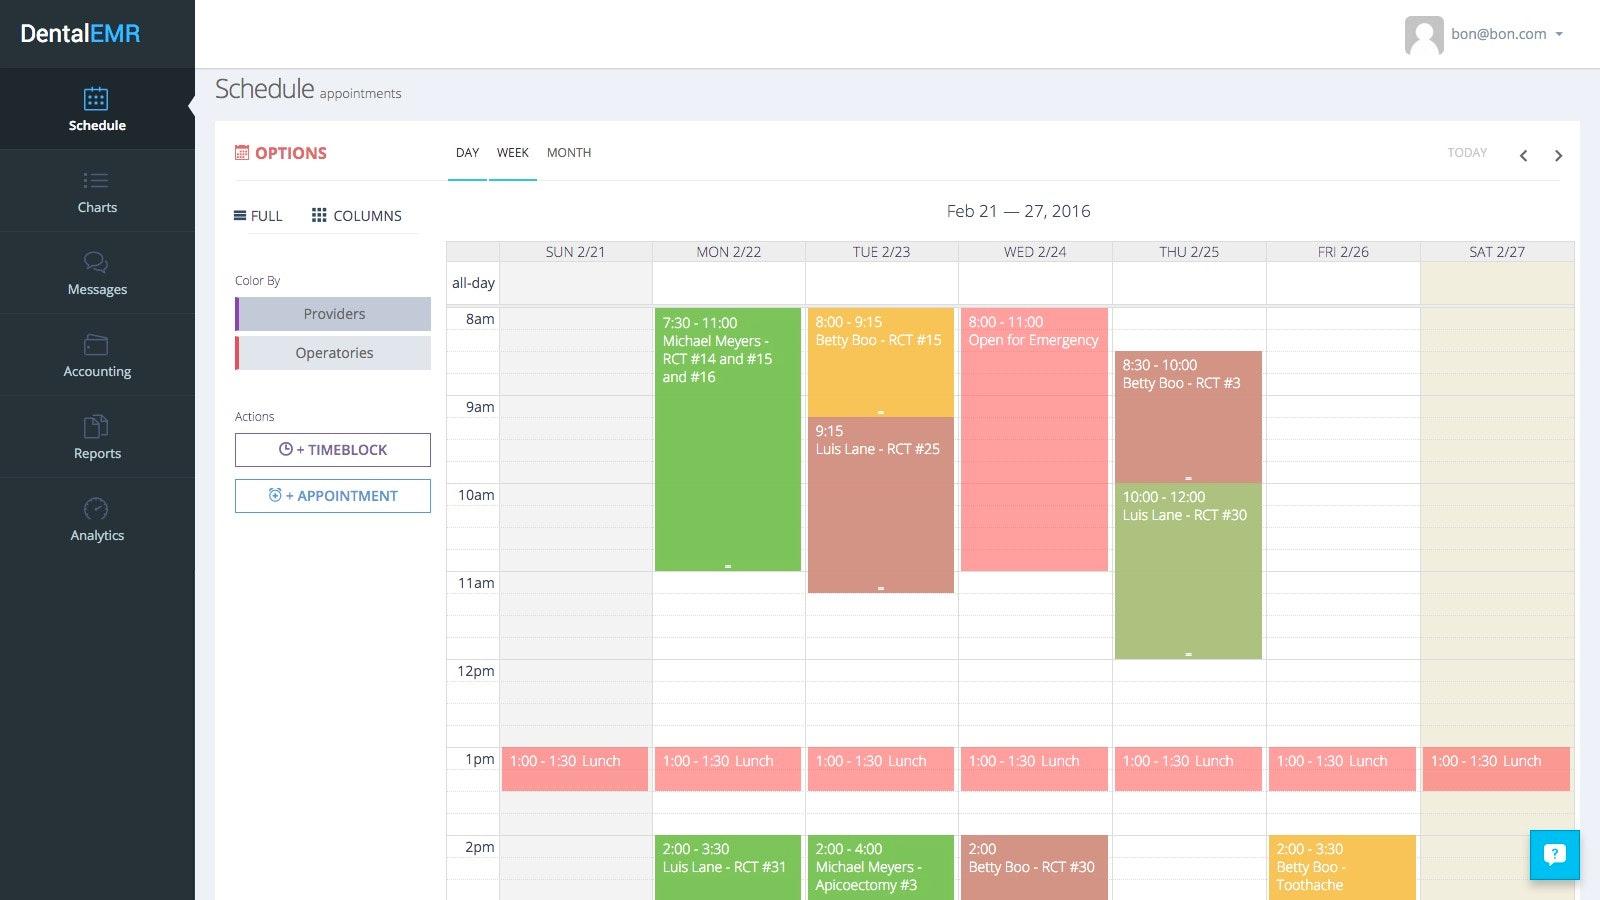 Treatment schedule